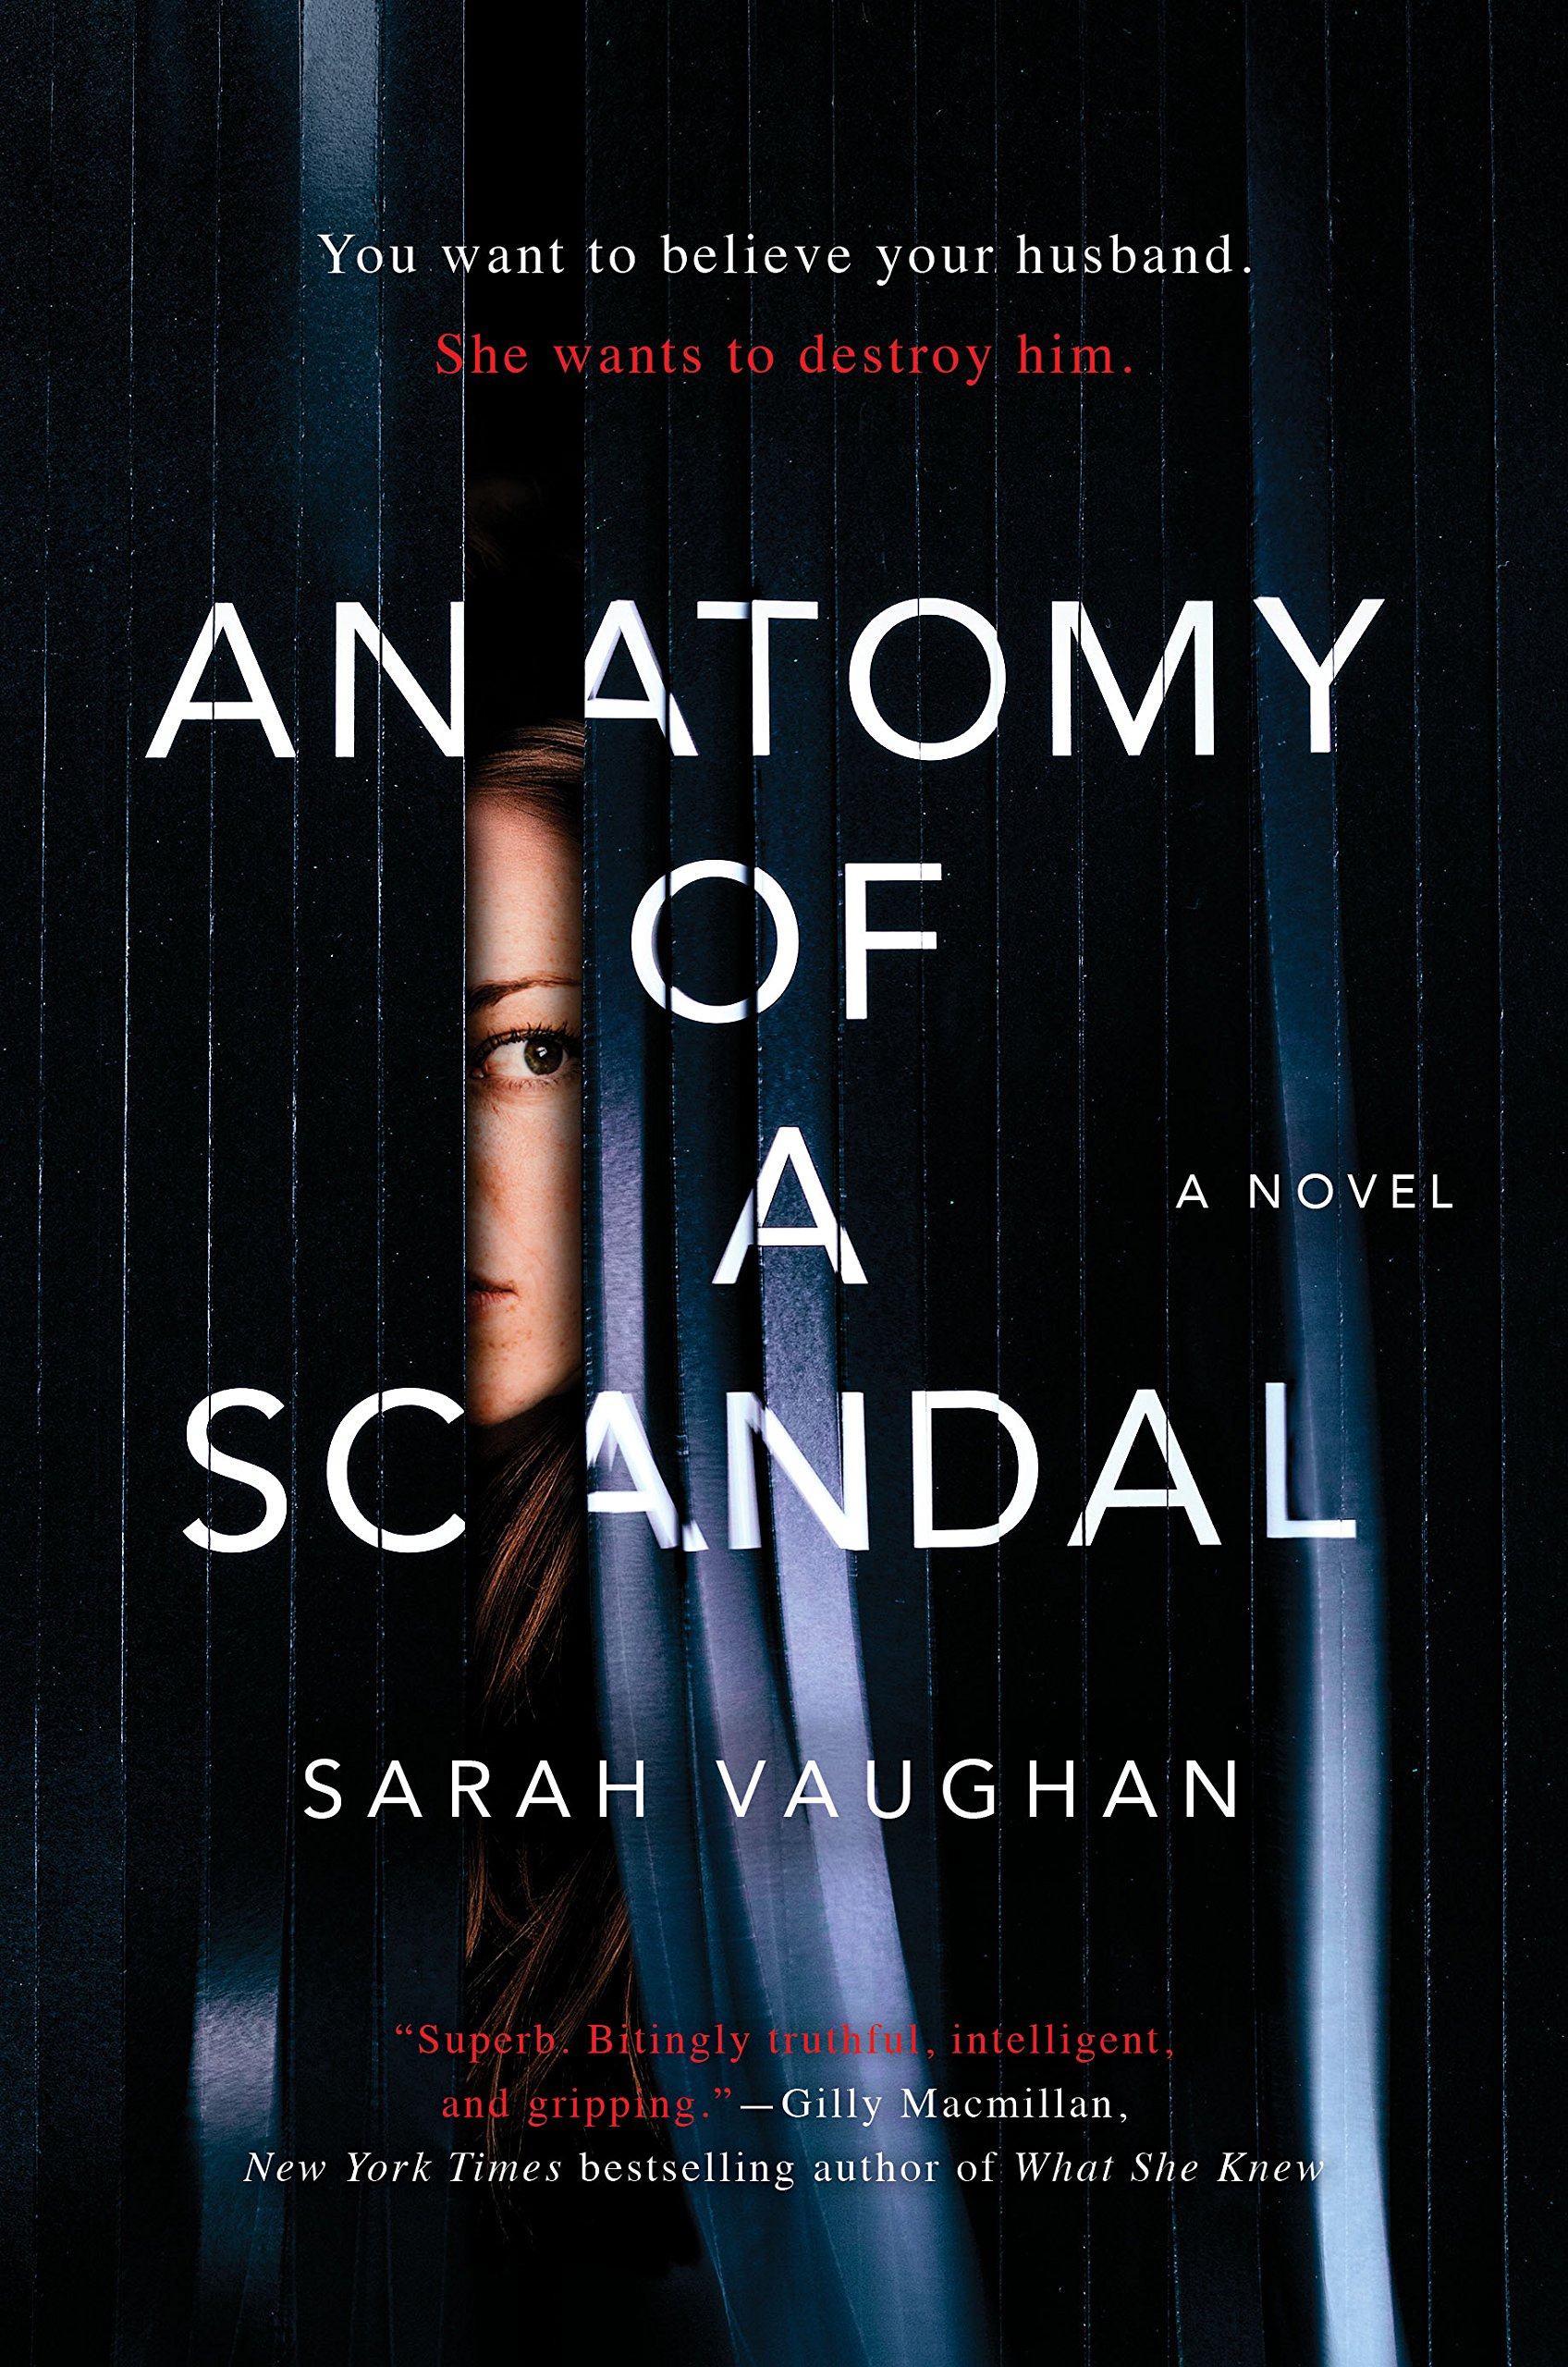 anatomy of a scandal by sarah vaughan.jpg